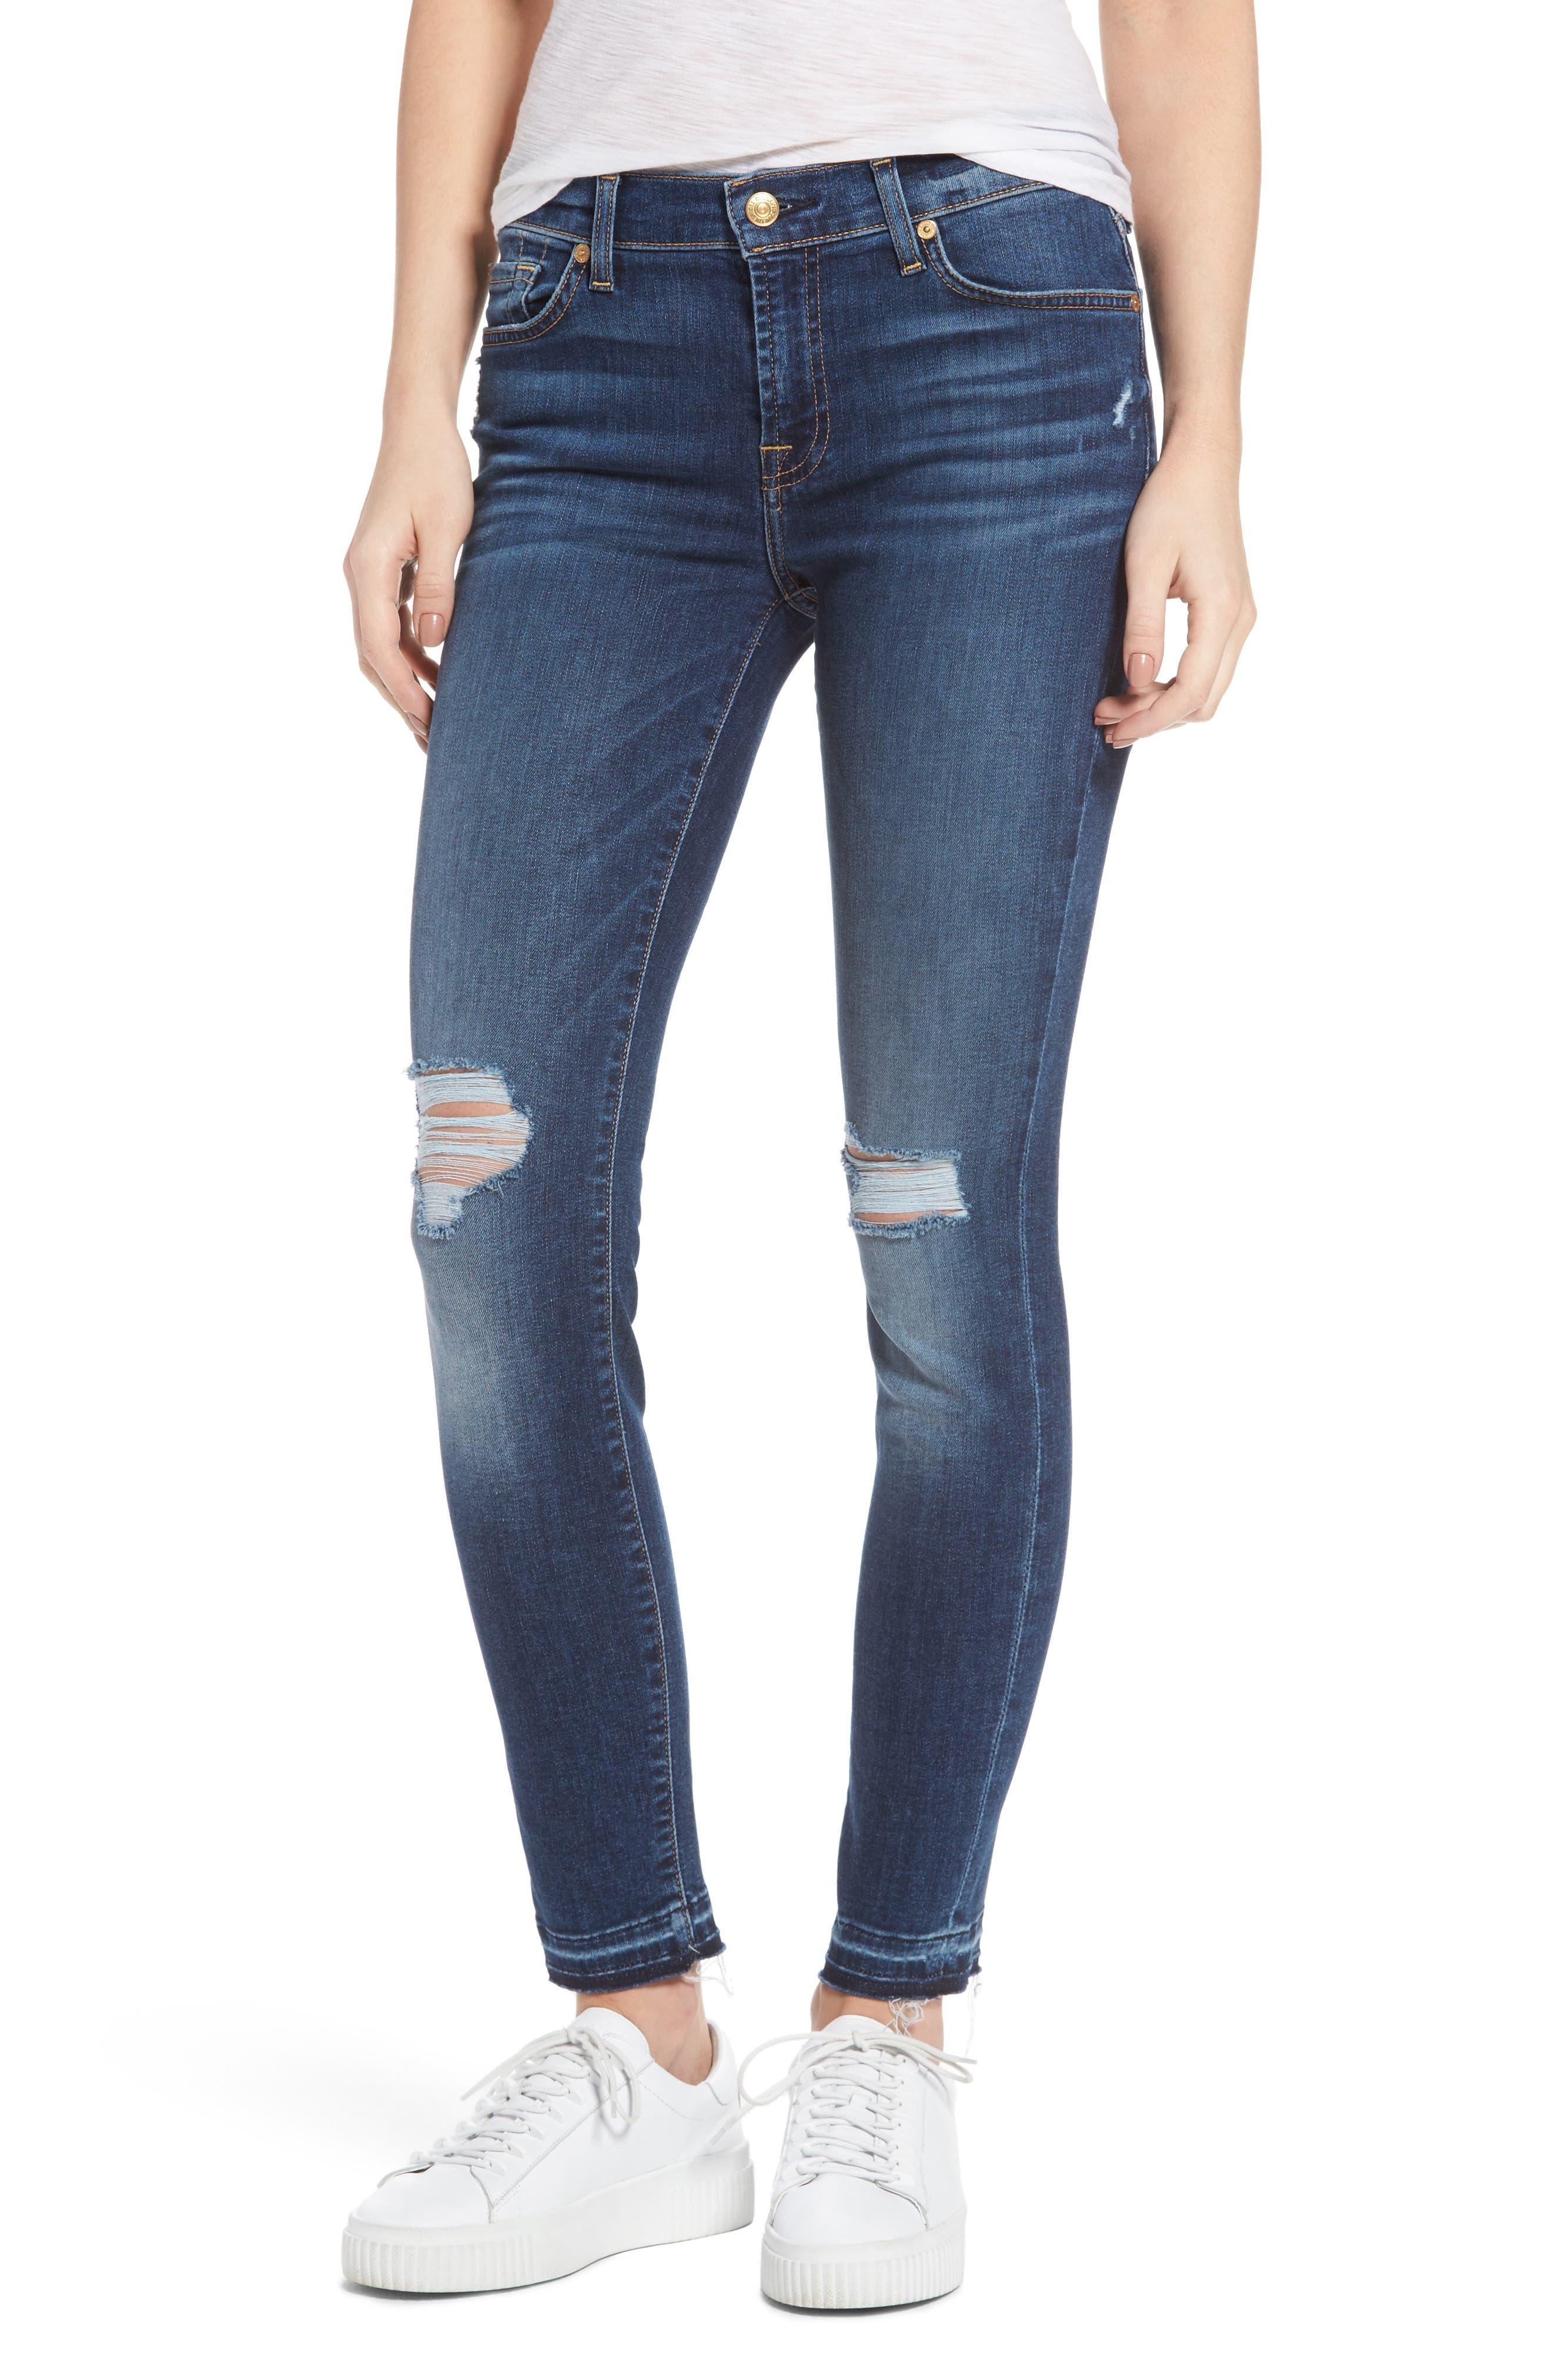 Alternate Image 1 Selected - 7 For All Mankind® Ankle Skinny Jeans (Stunning Bleeker)